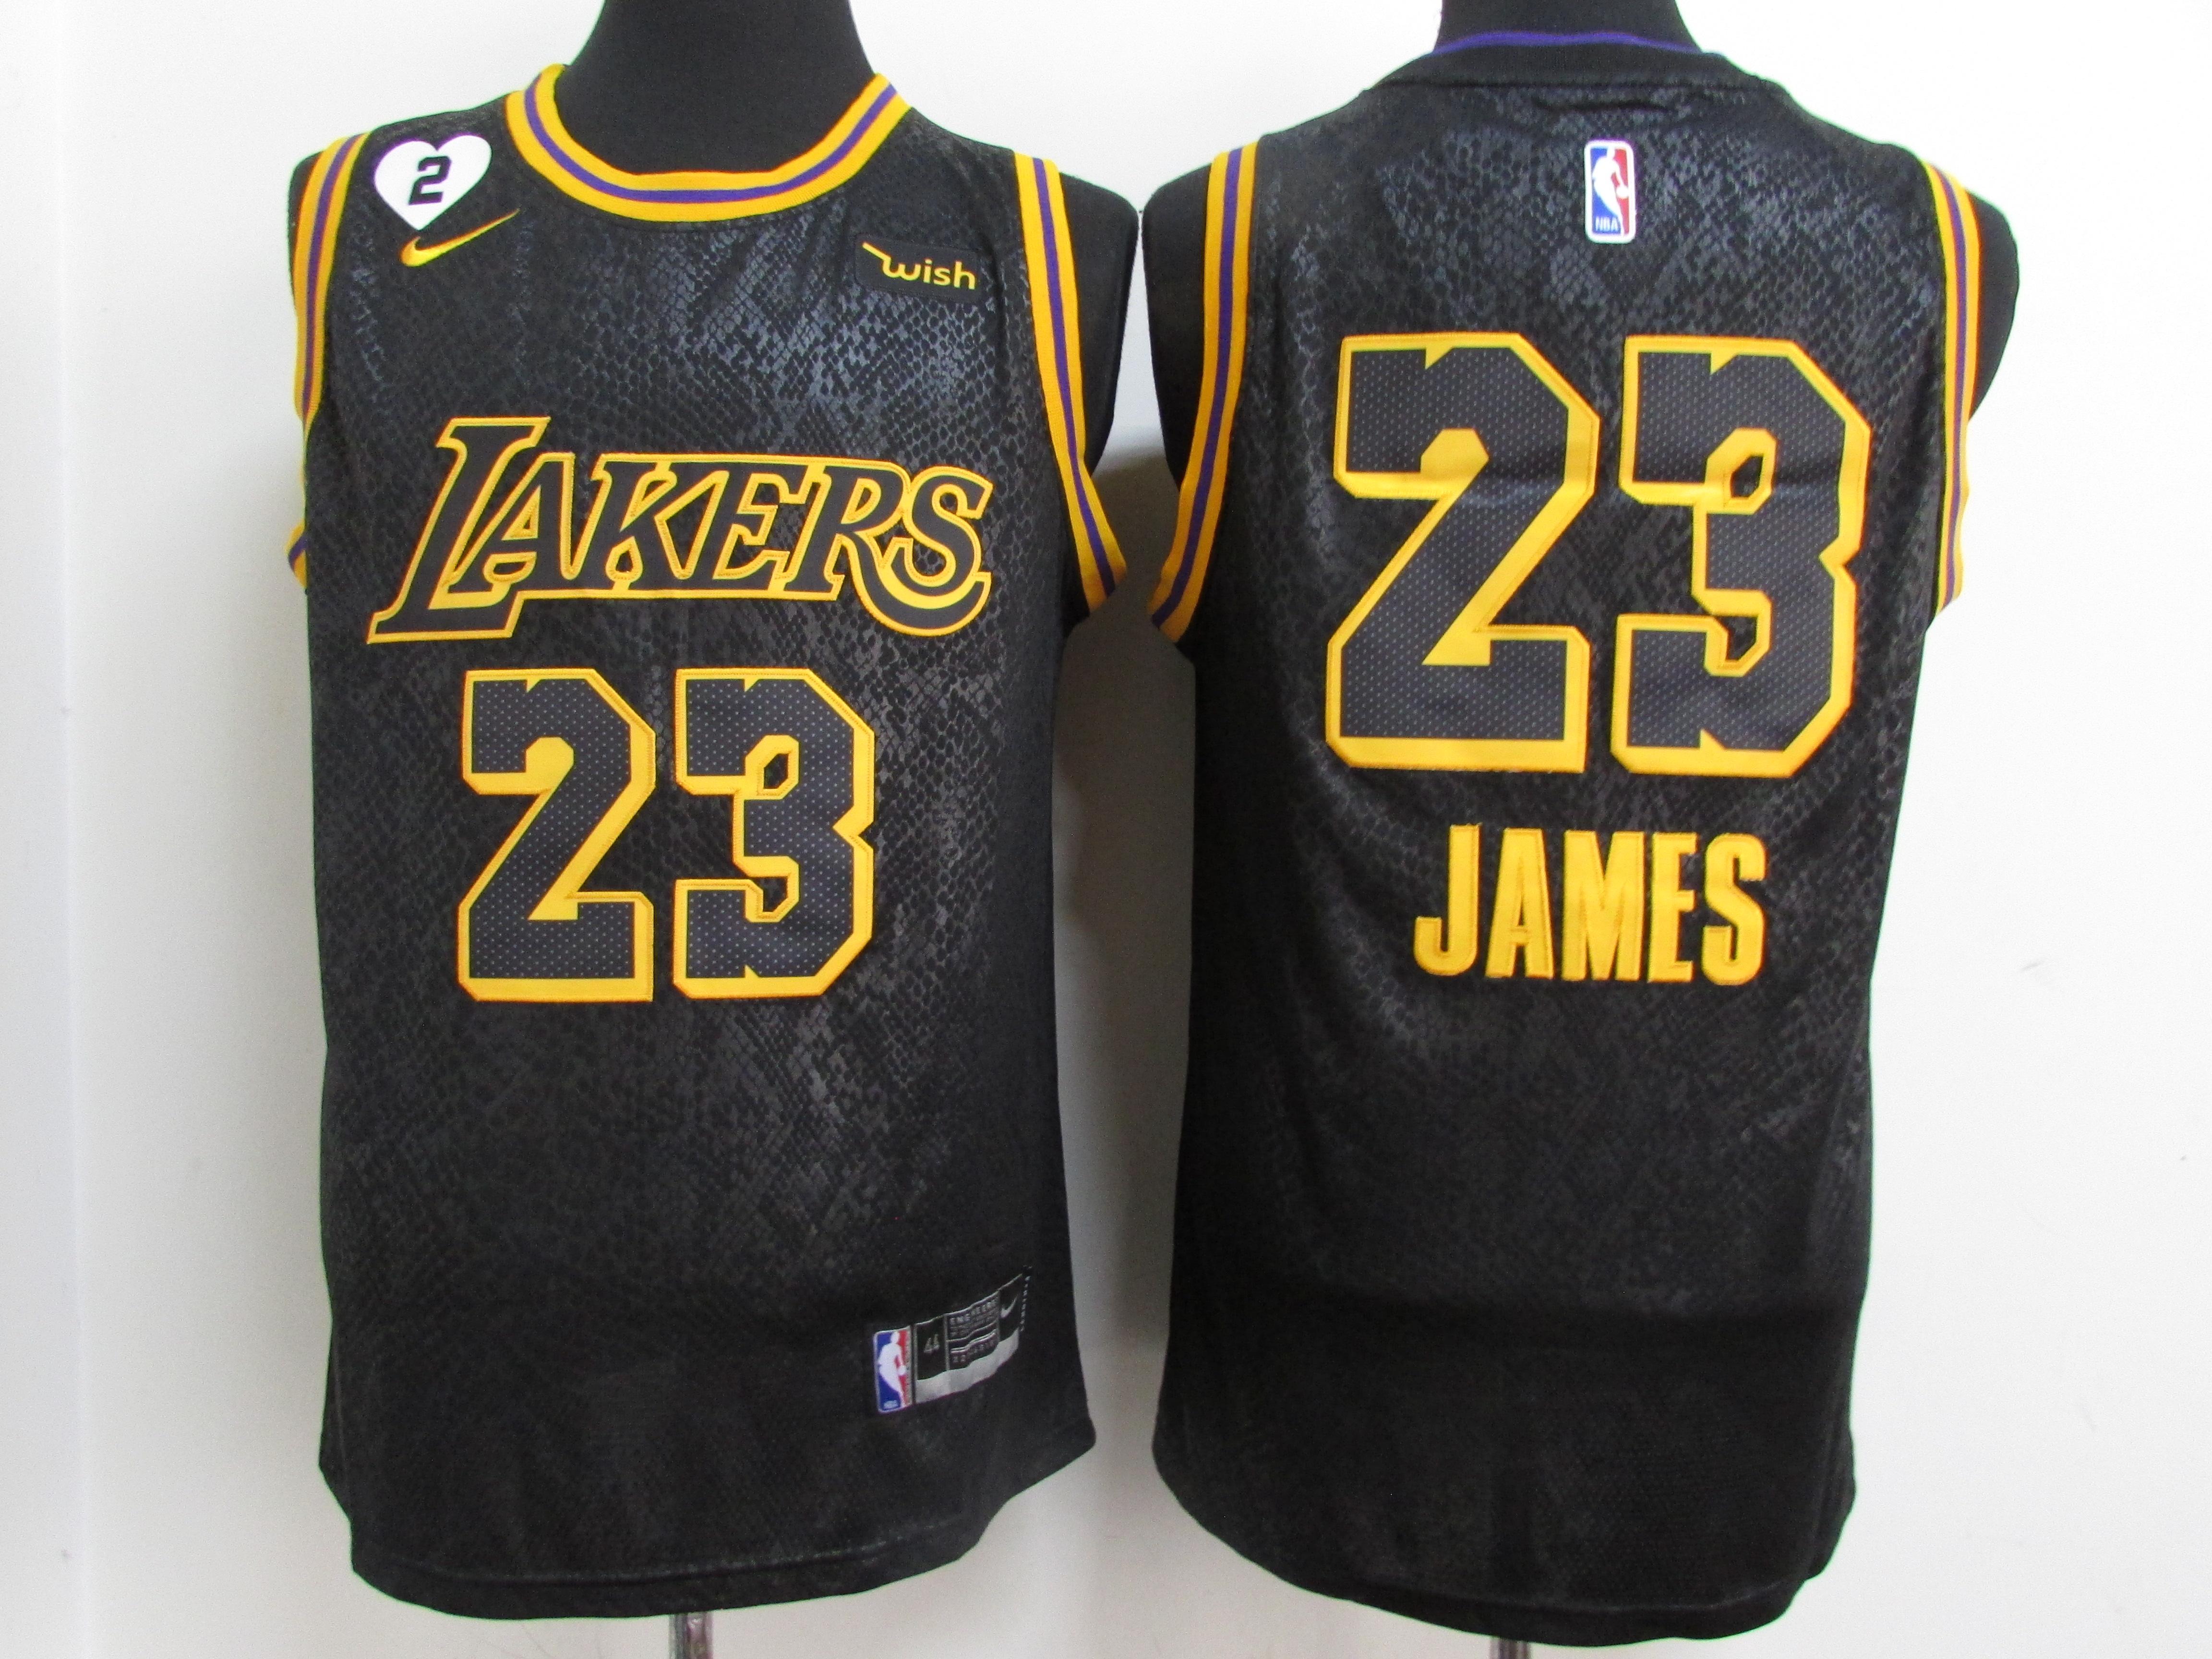 Lakers 23 Lebron James Black Mamba 2 Heart Gigi Patch Nike Swingman Jersey